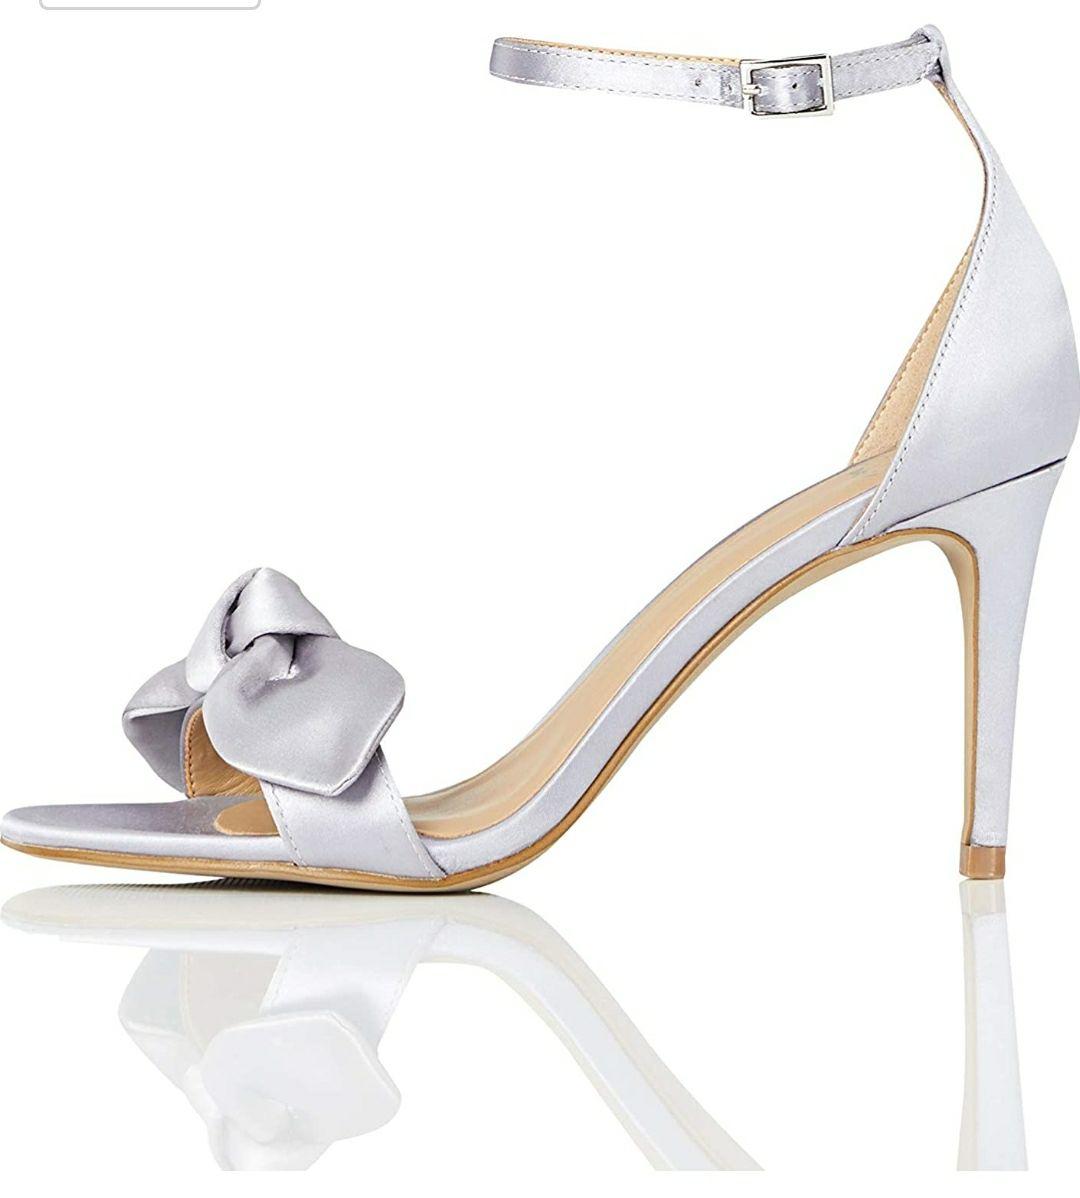 TALLA 36.5 - Marca Amazon - TRUTH & FABLE Zapatos deDama de Honor Mujer